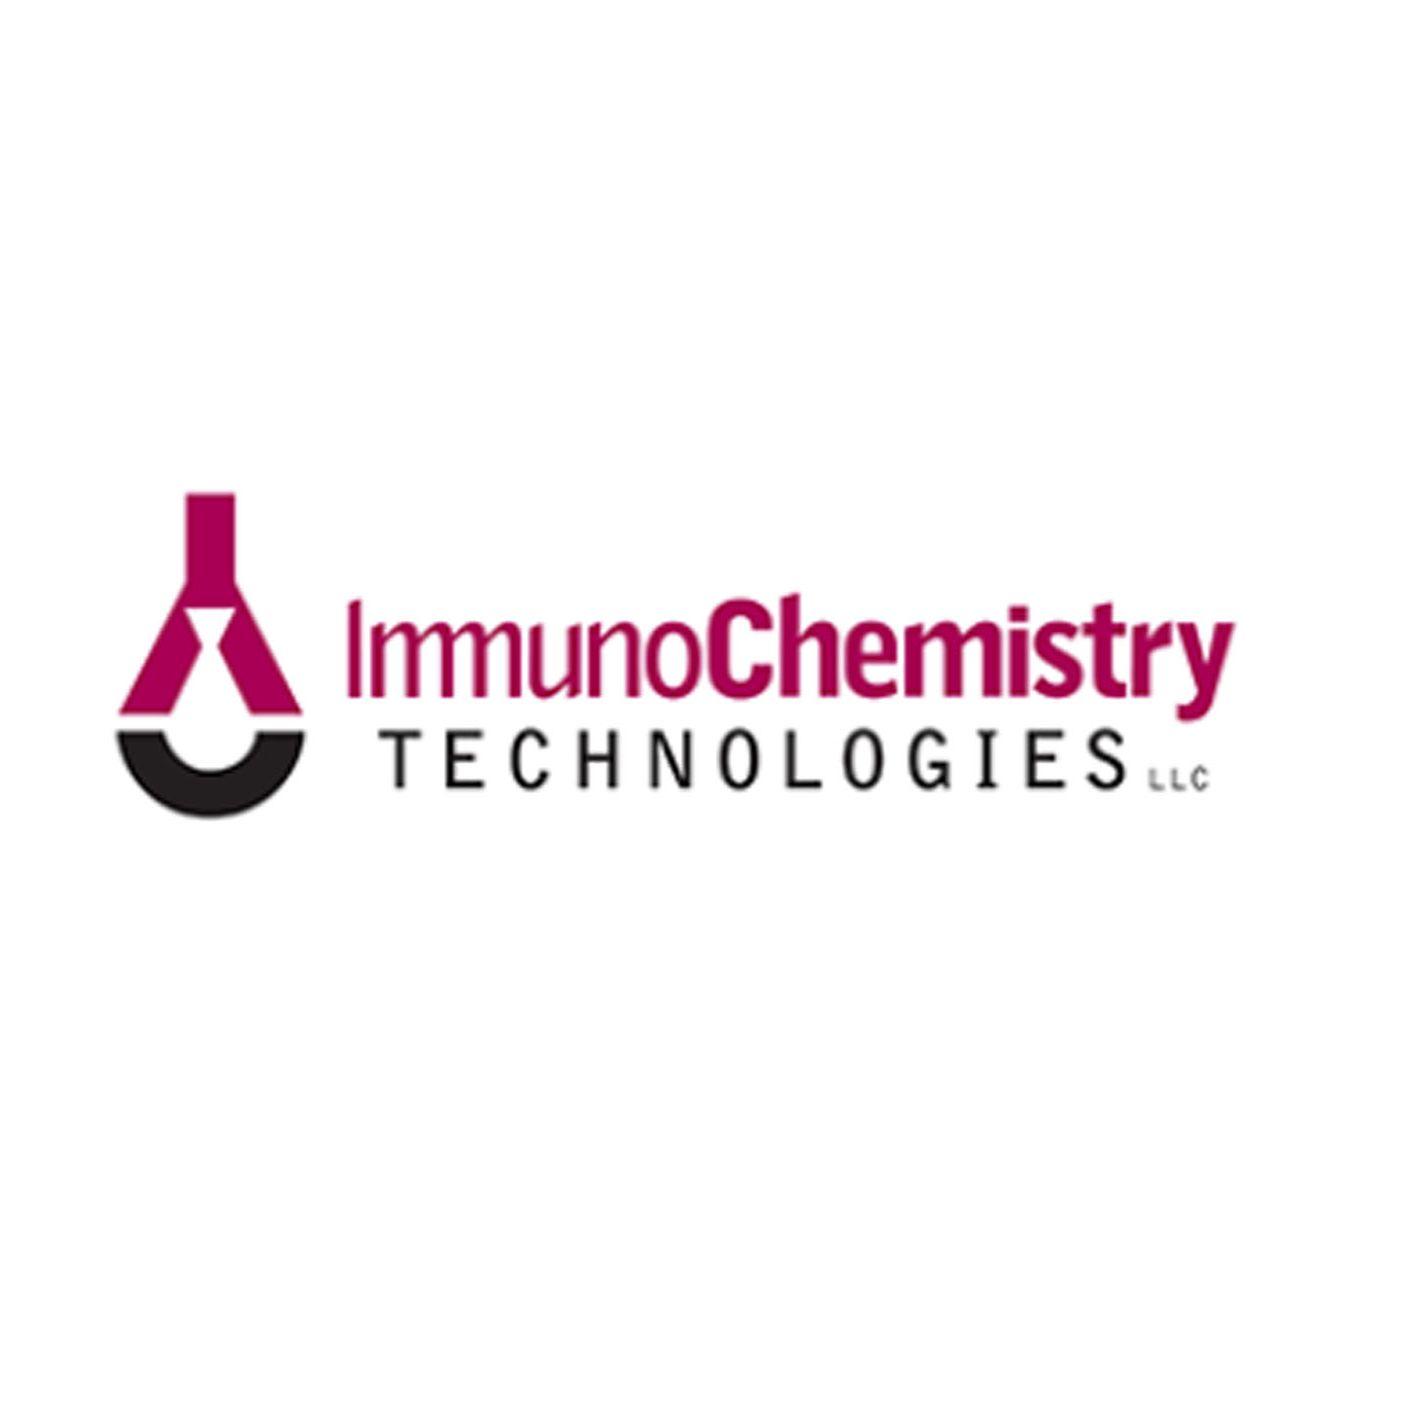 ImmunoChemistry Technologies(ICT)9137 Intracellular GSH Assay,细胞内谷胱甘肽测定,100tests,现货